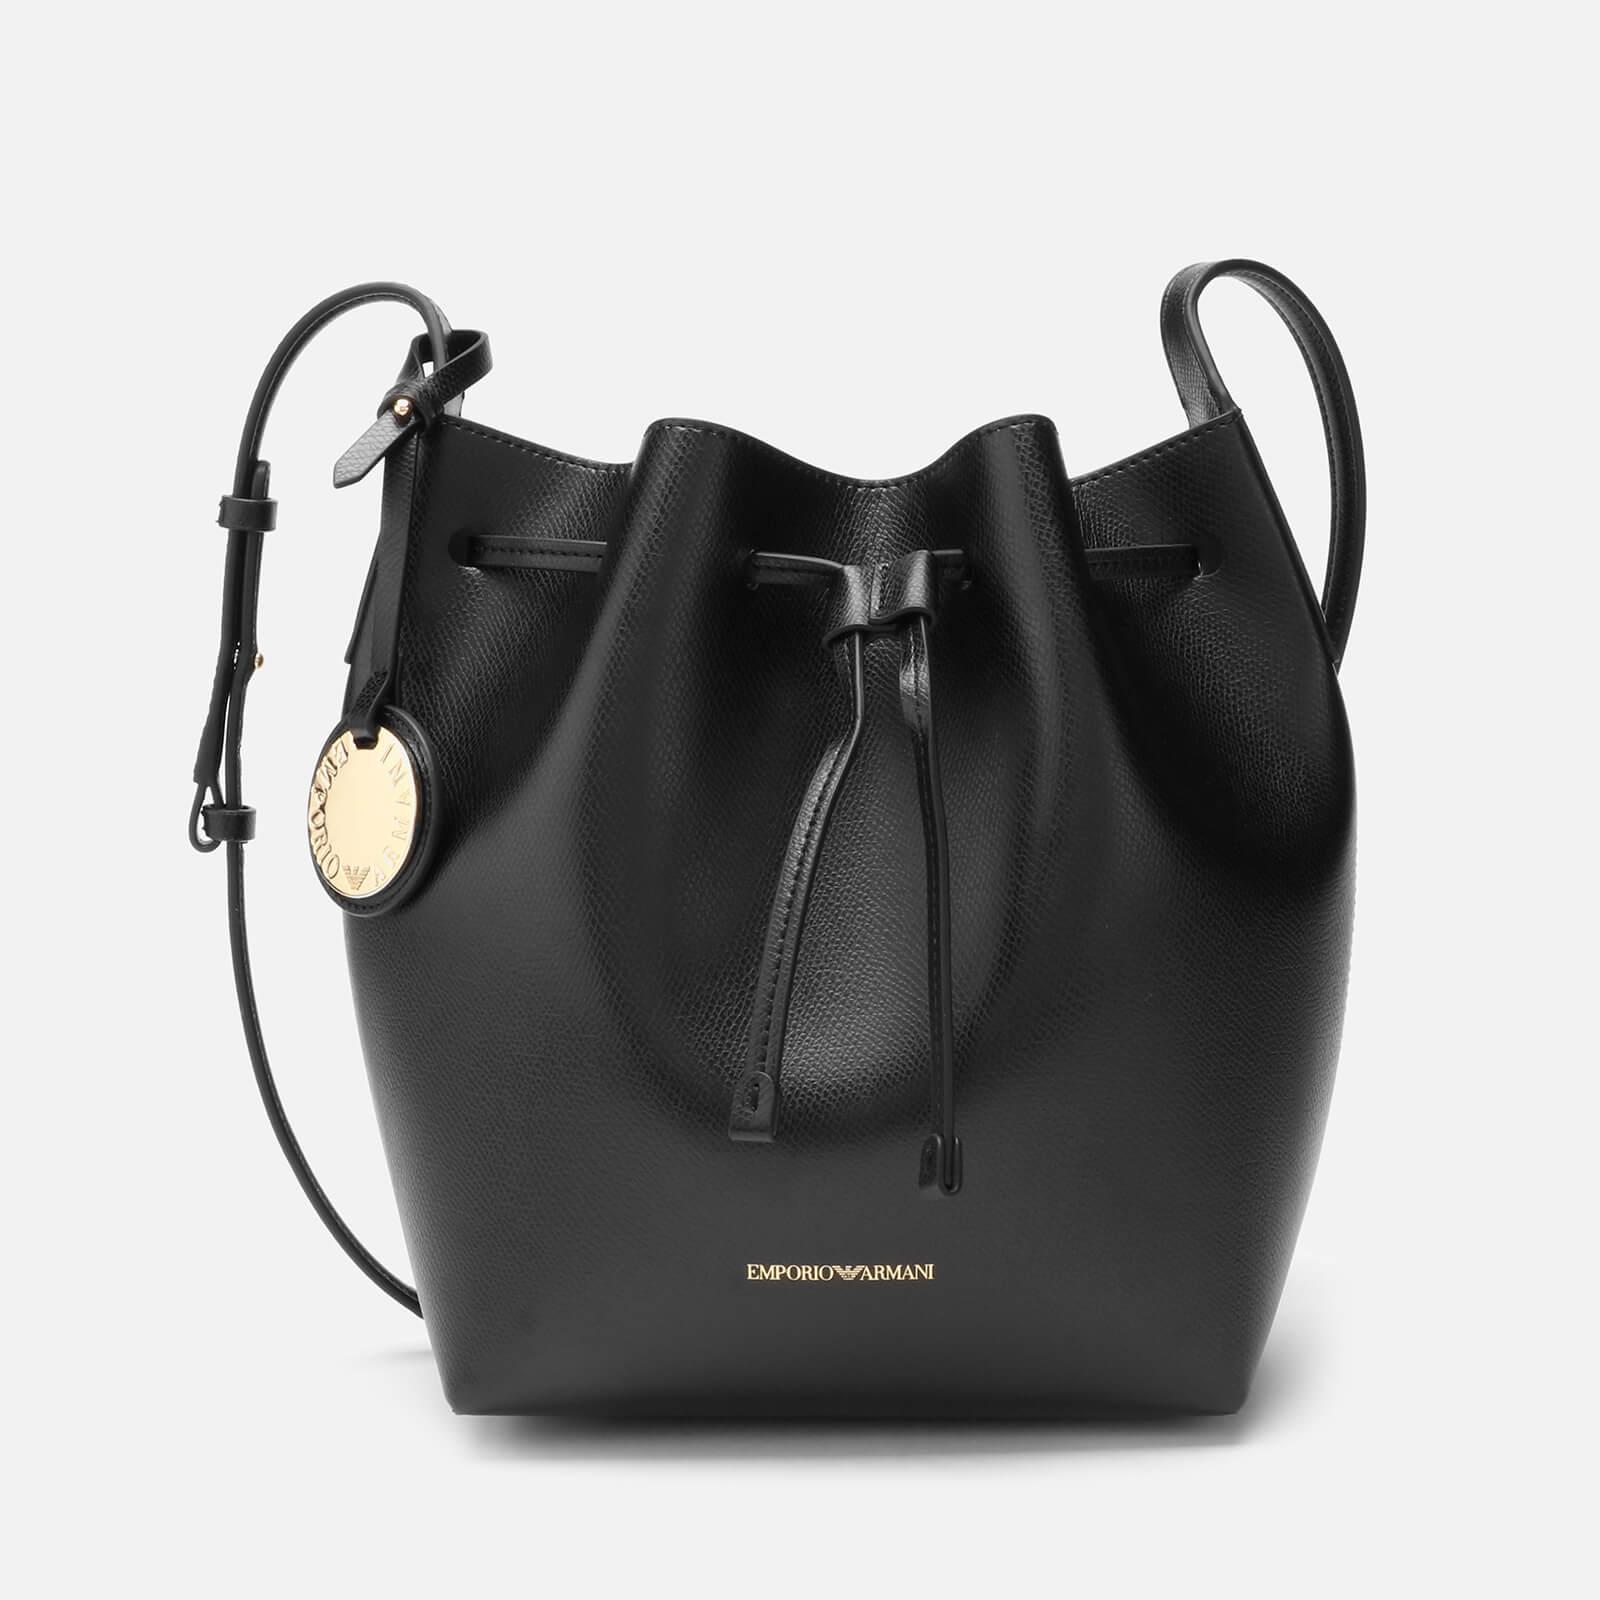 d45cd0a7cf Emporio Armani Women's Bucket Bag - Nero/Rosso